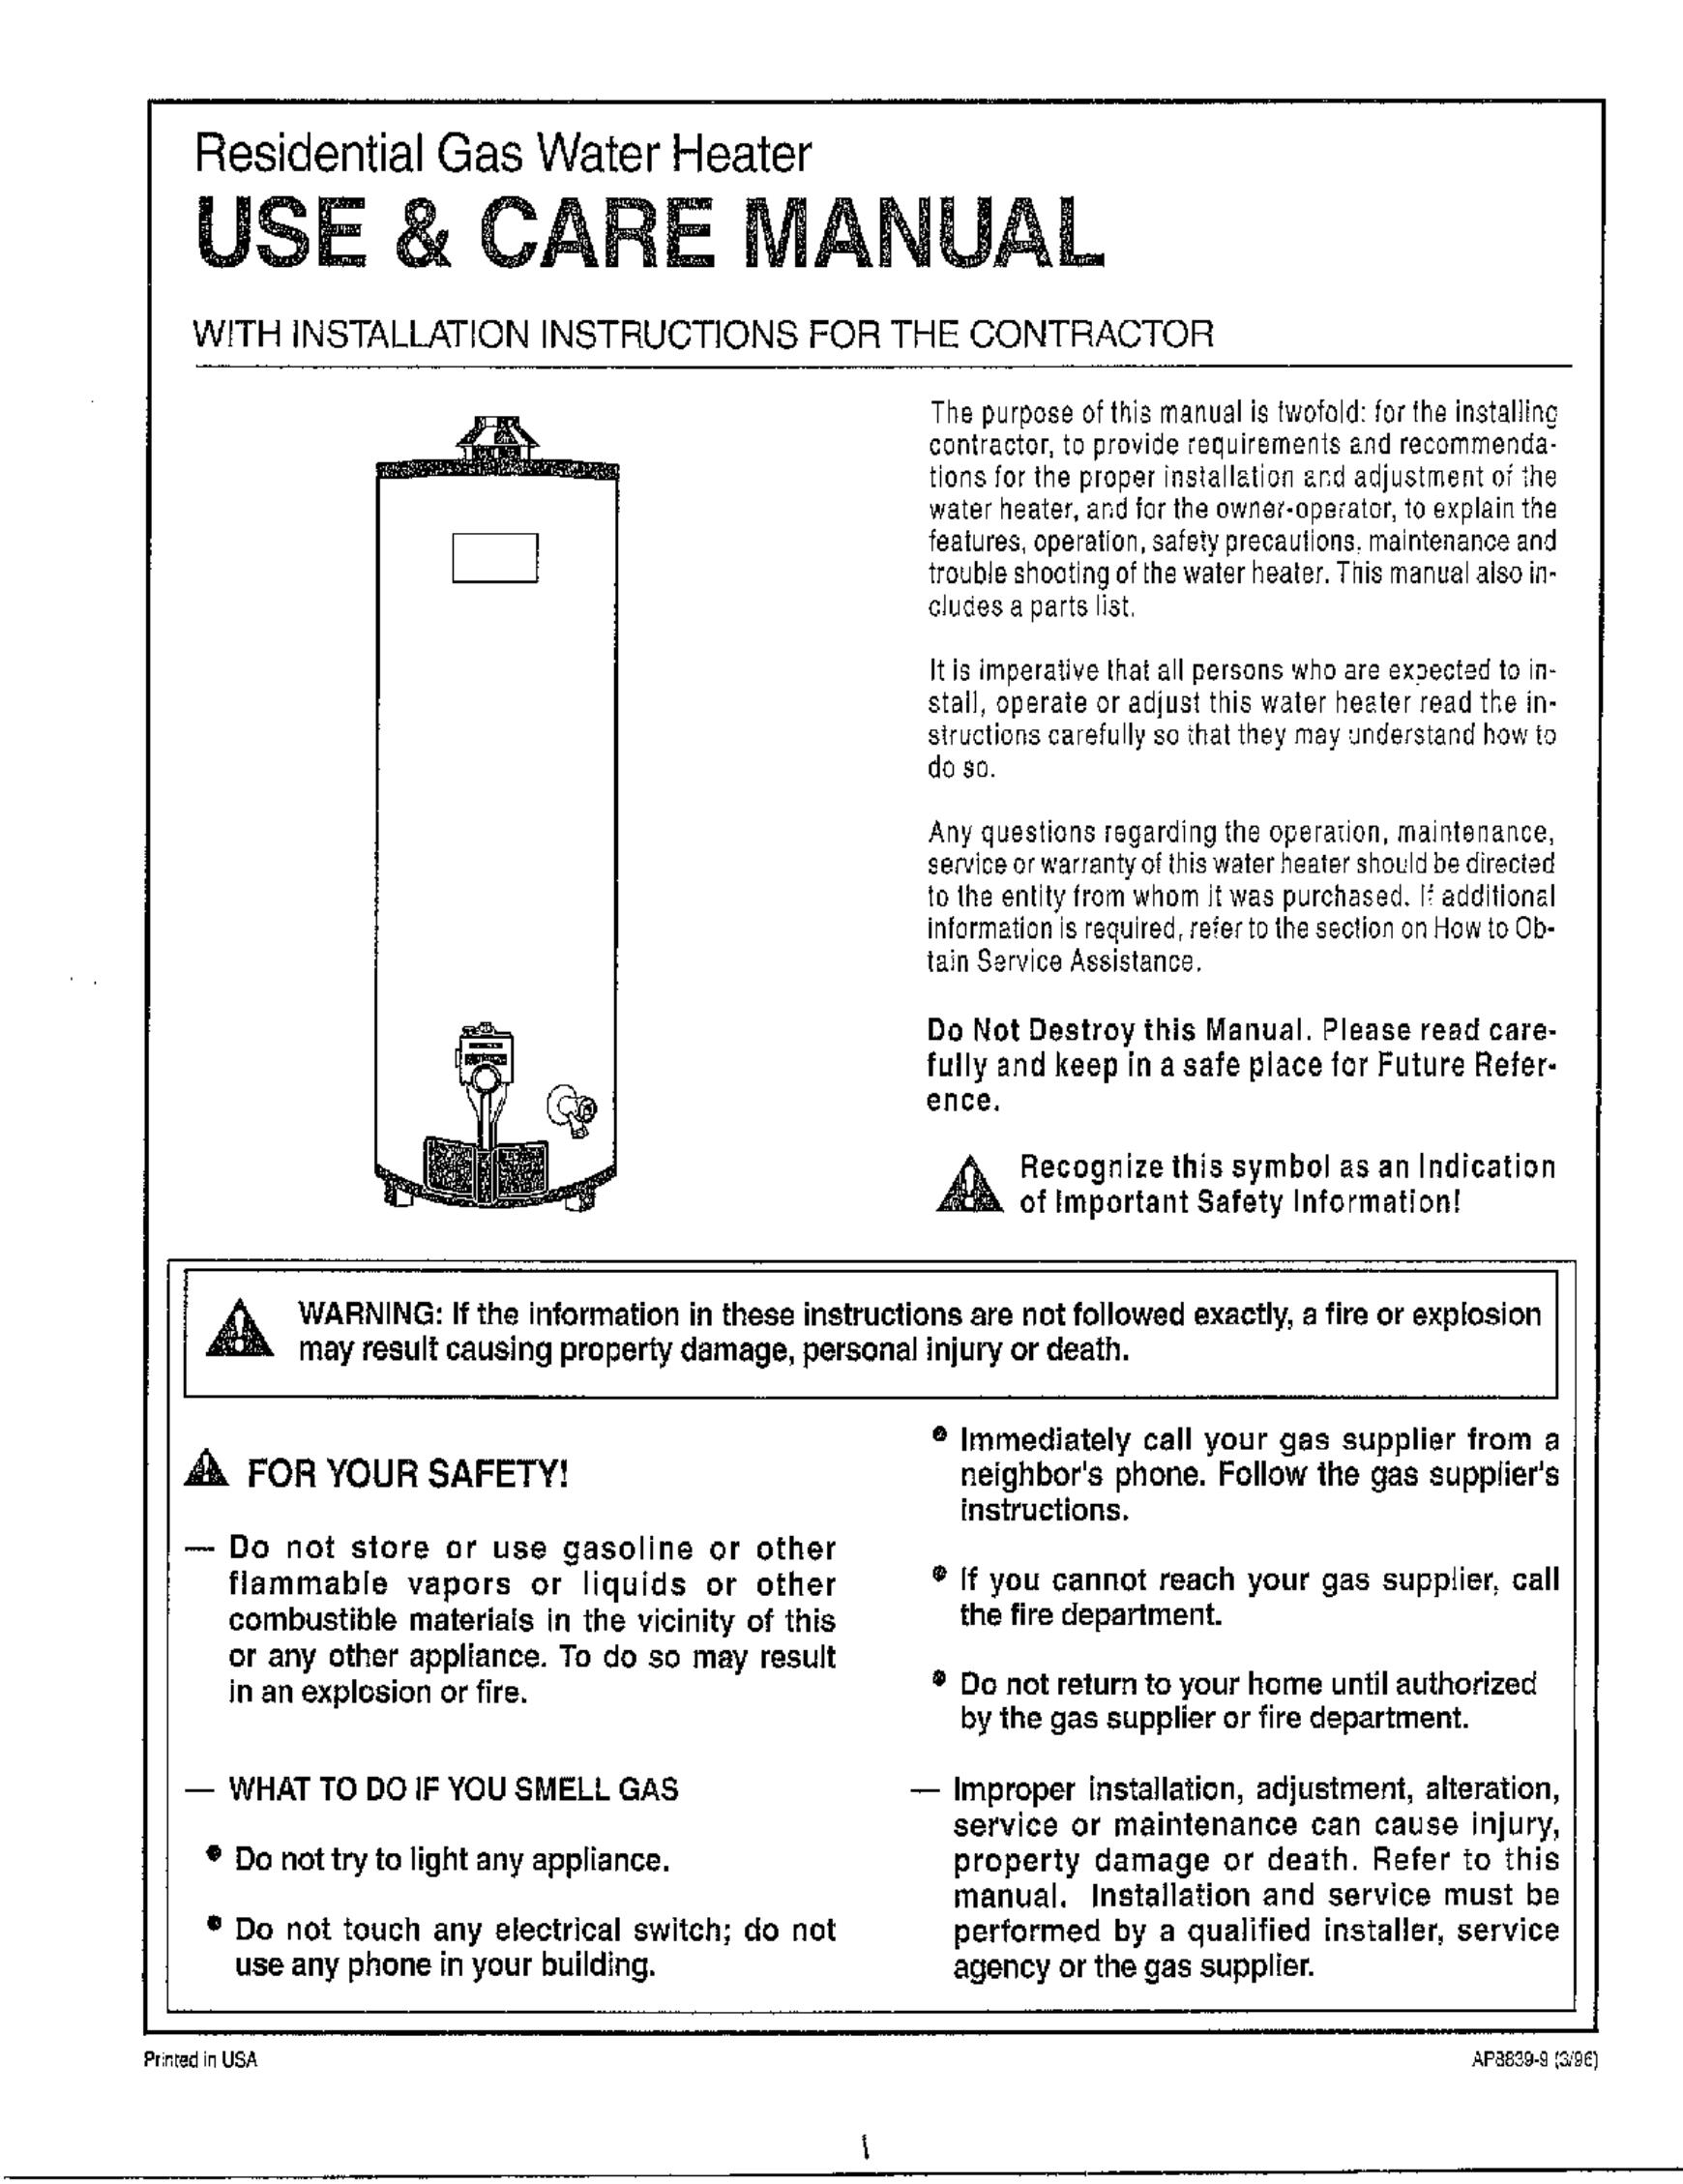 gas water heater diagram rheem 36406 user manual rheen corp gas water heater manuals and gas water heater schematic diagram rheem 36406 user manual rheen corp gas